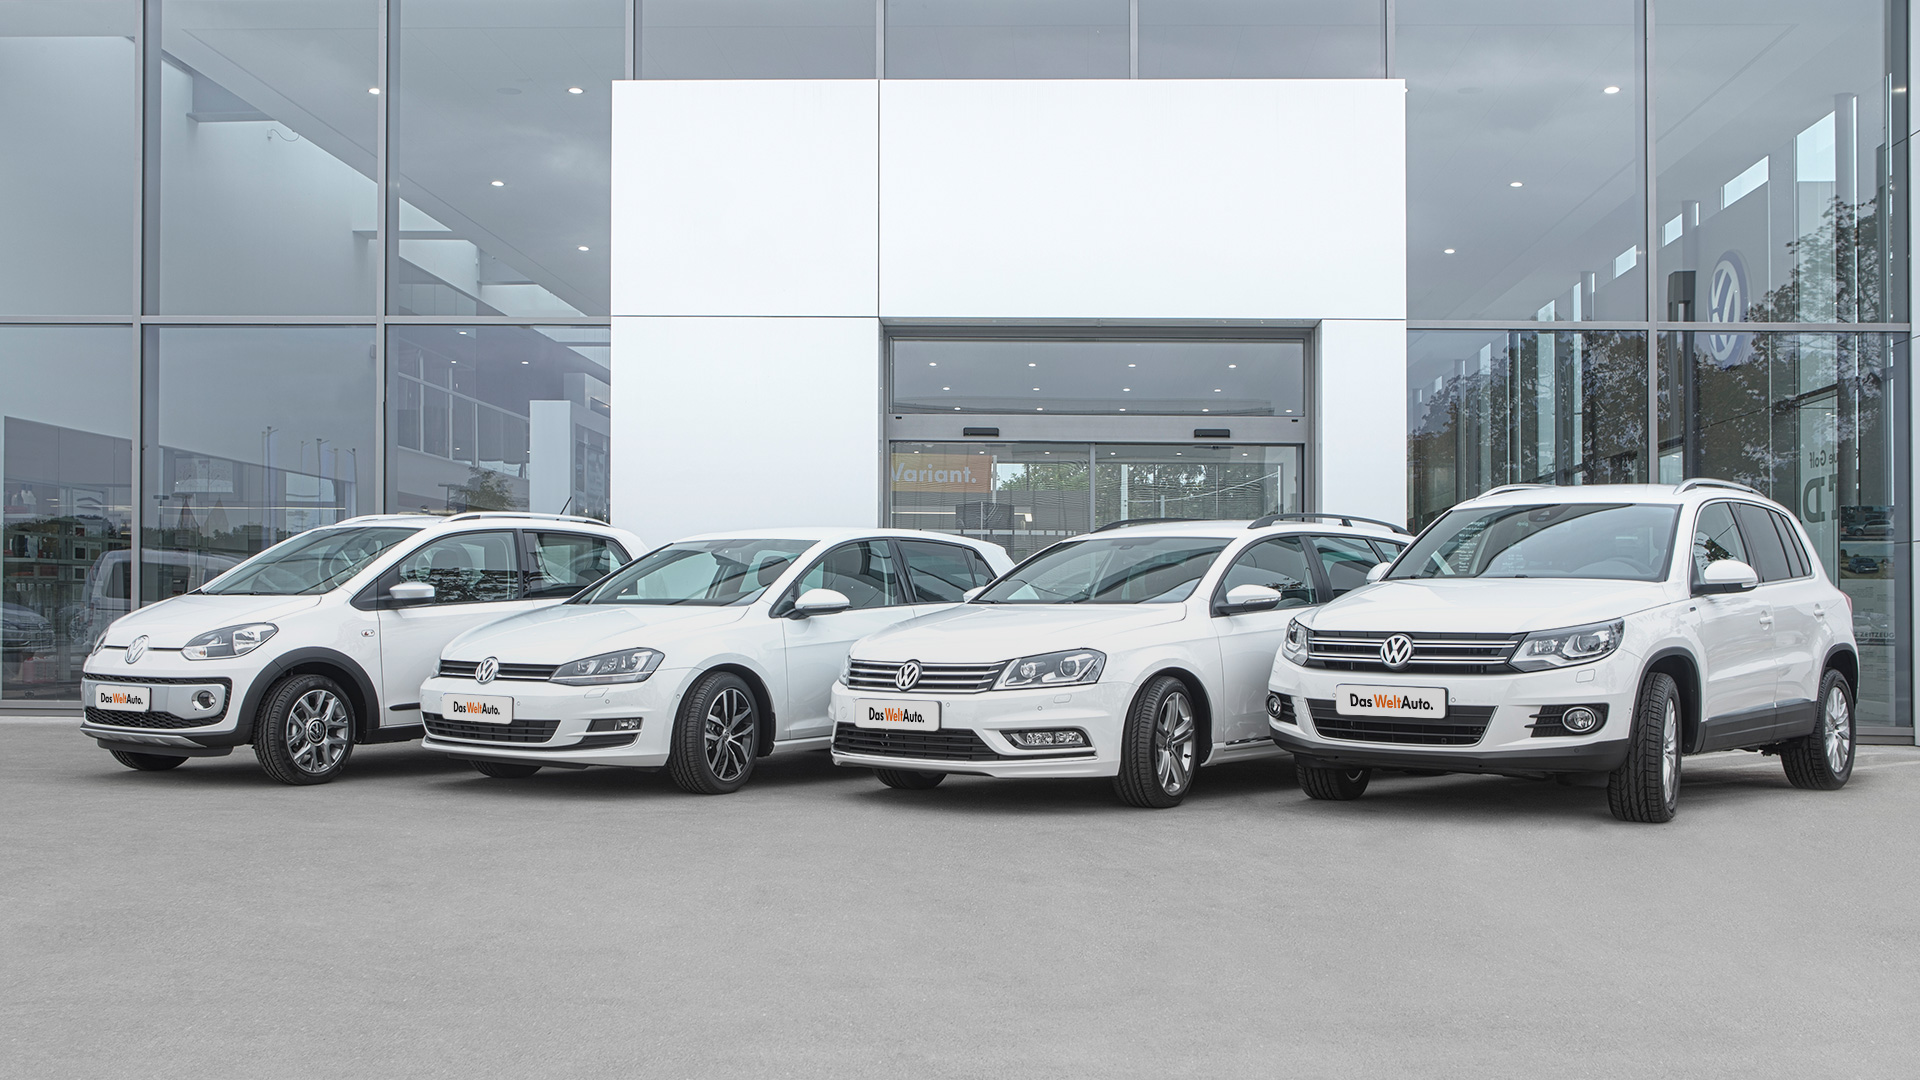 Najpopularniejsze modele marki Volkswagen